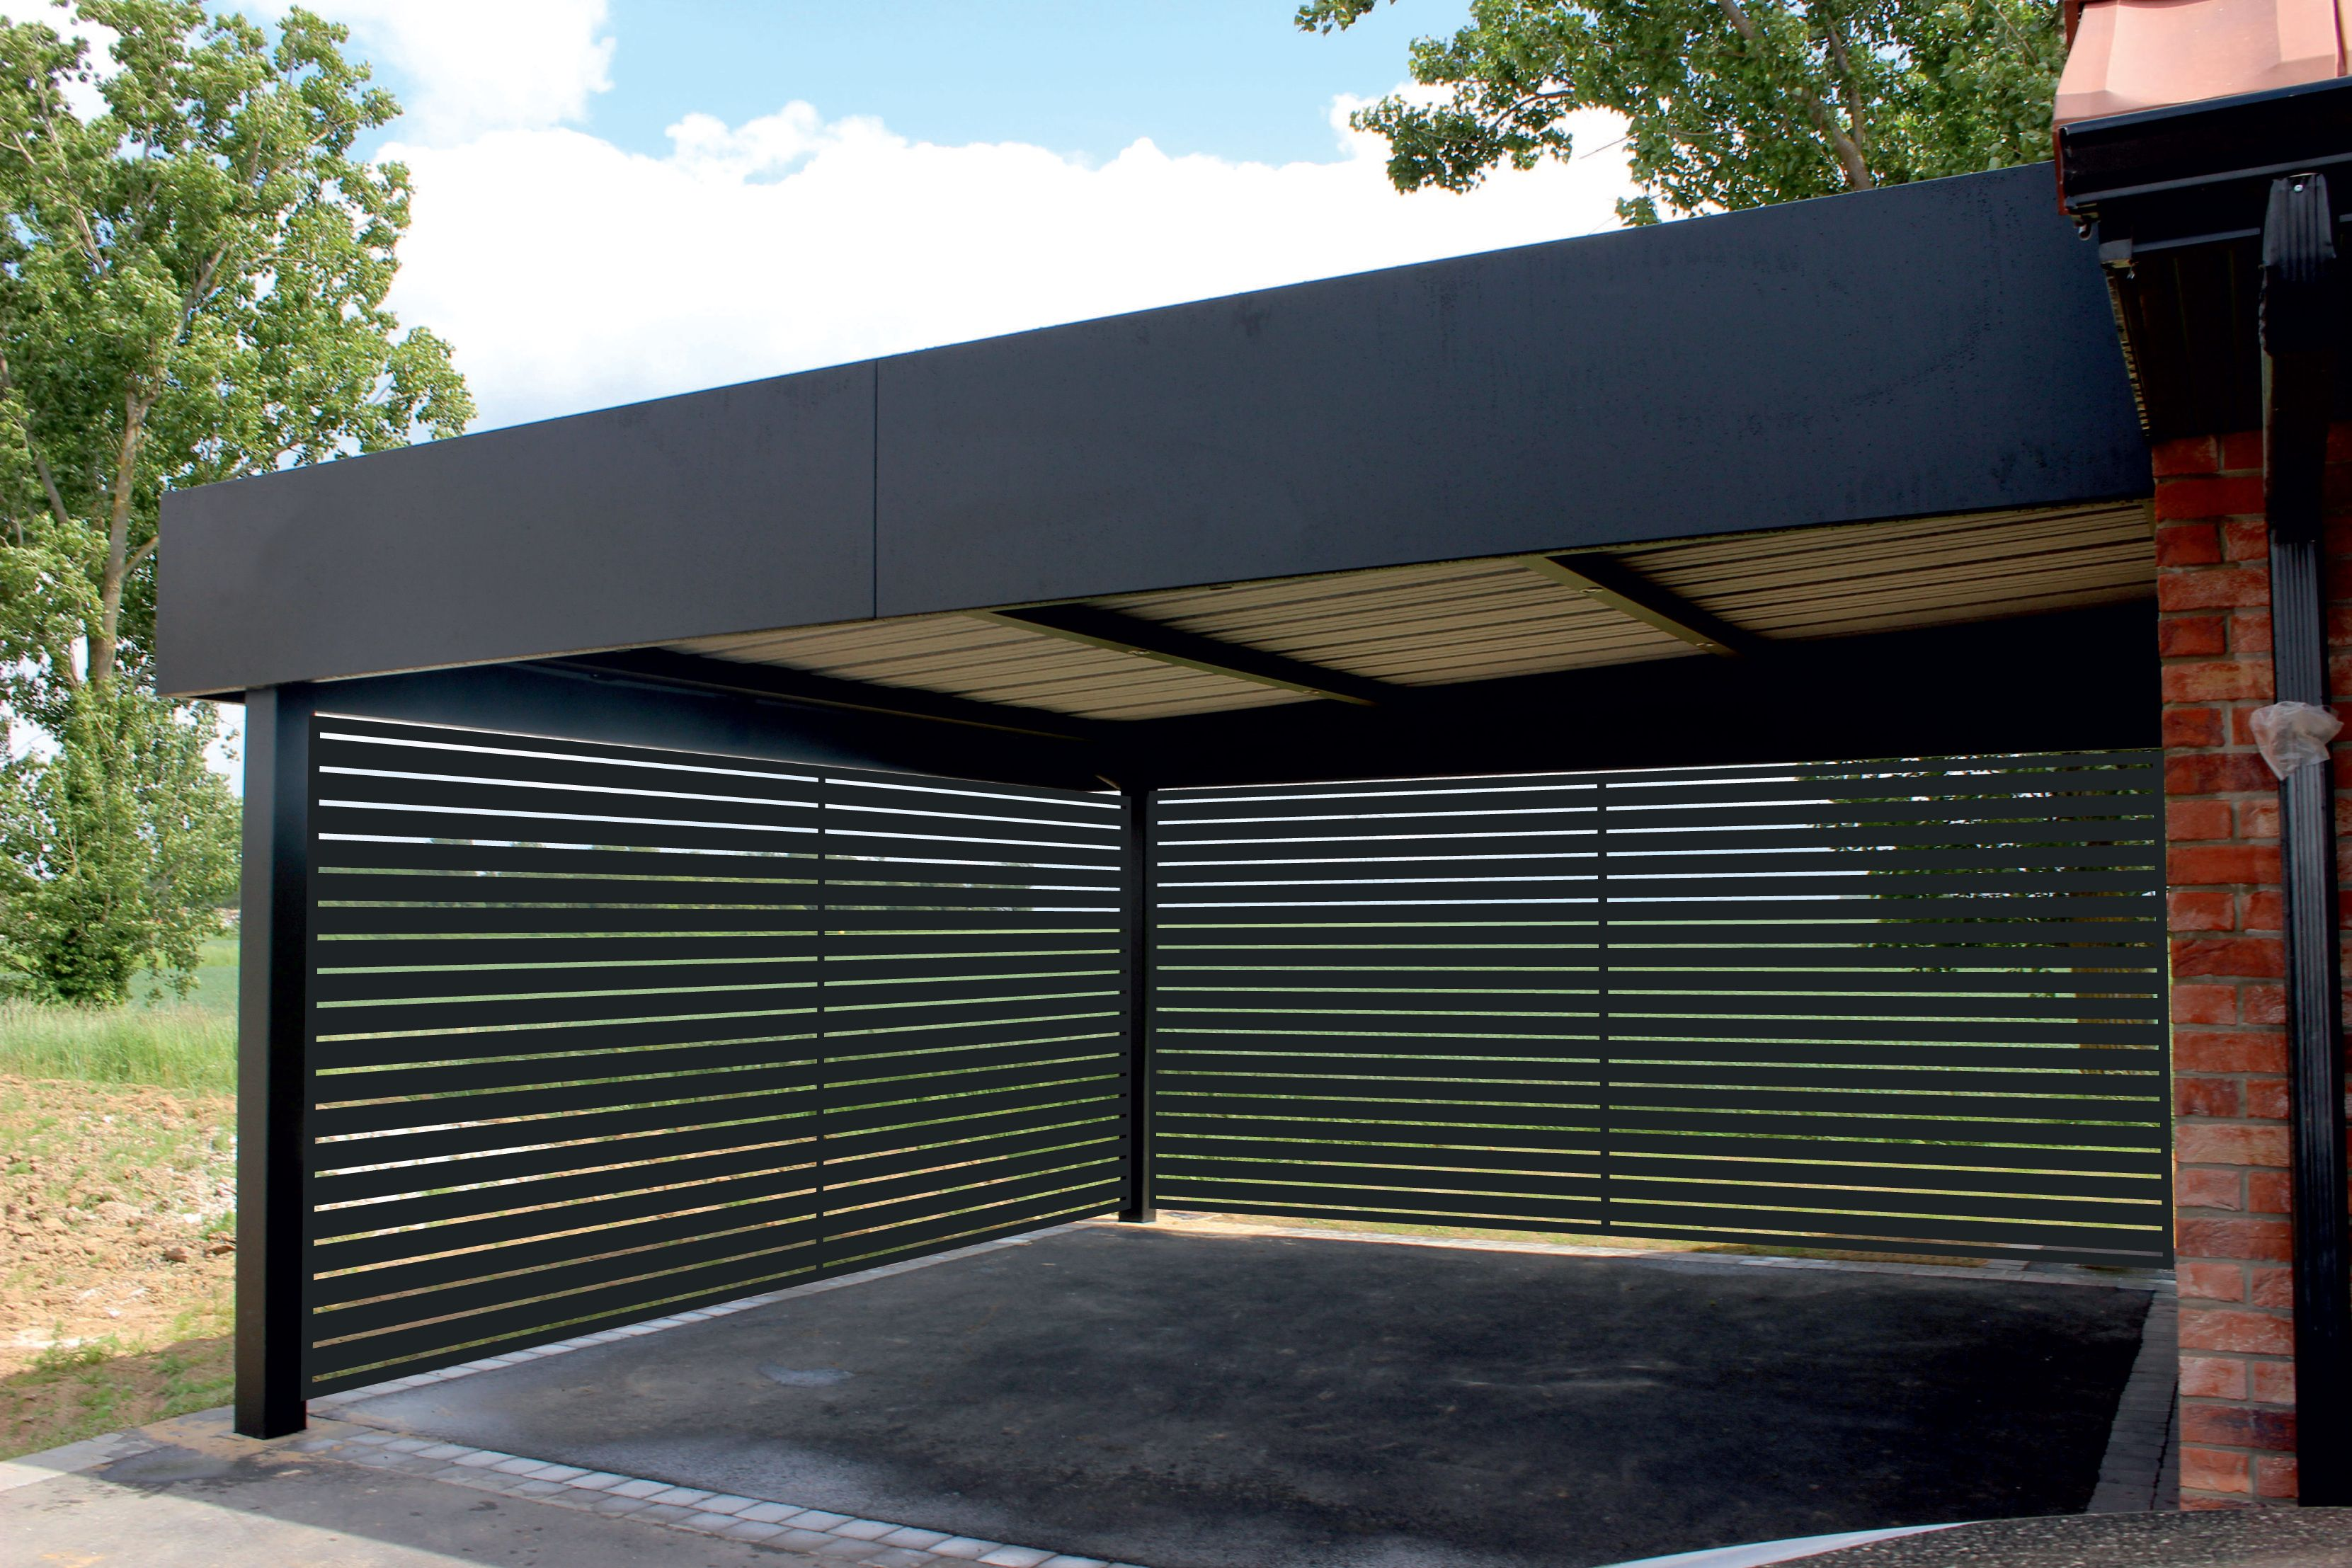 Rv Metal Carport Near Me 2021 in 2020 Carport designs